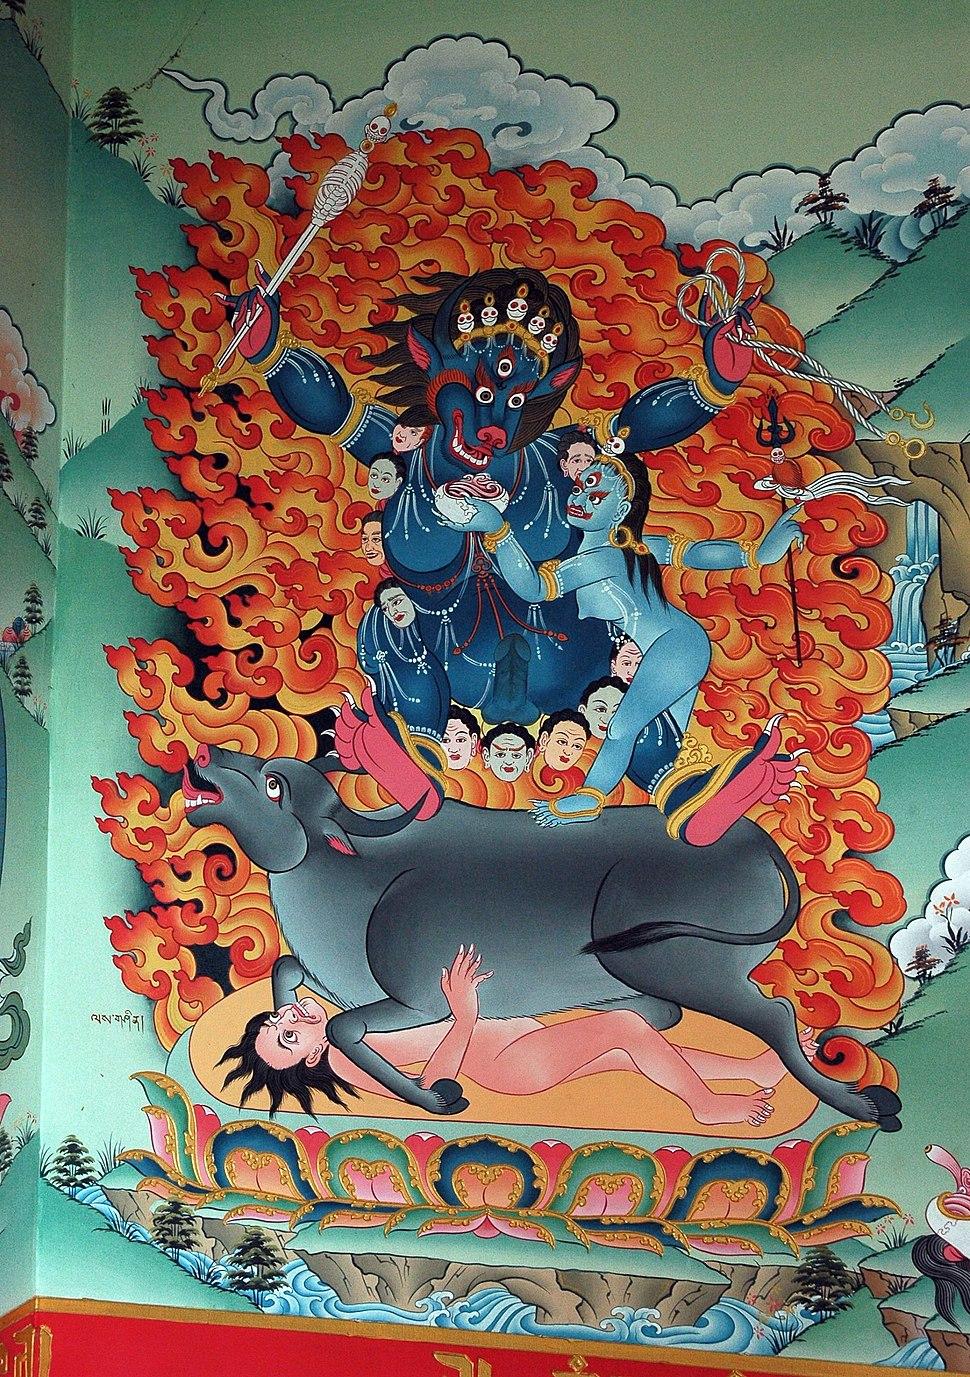 1 Yamantaka riding buffalo Shinjeshe gshin rje gshed rdo rje jigs byed, a Mahayana Yidam